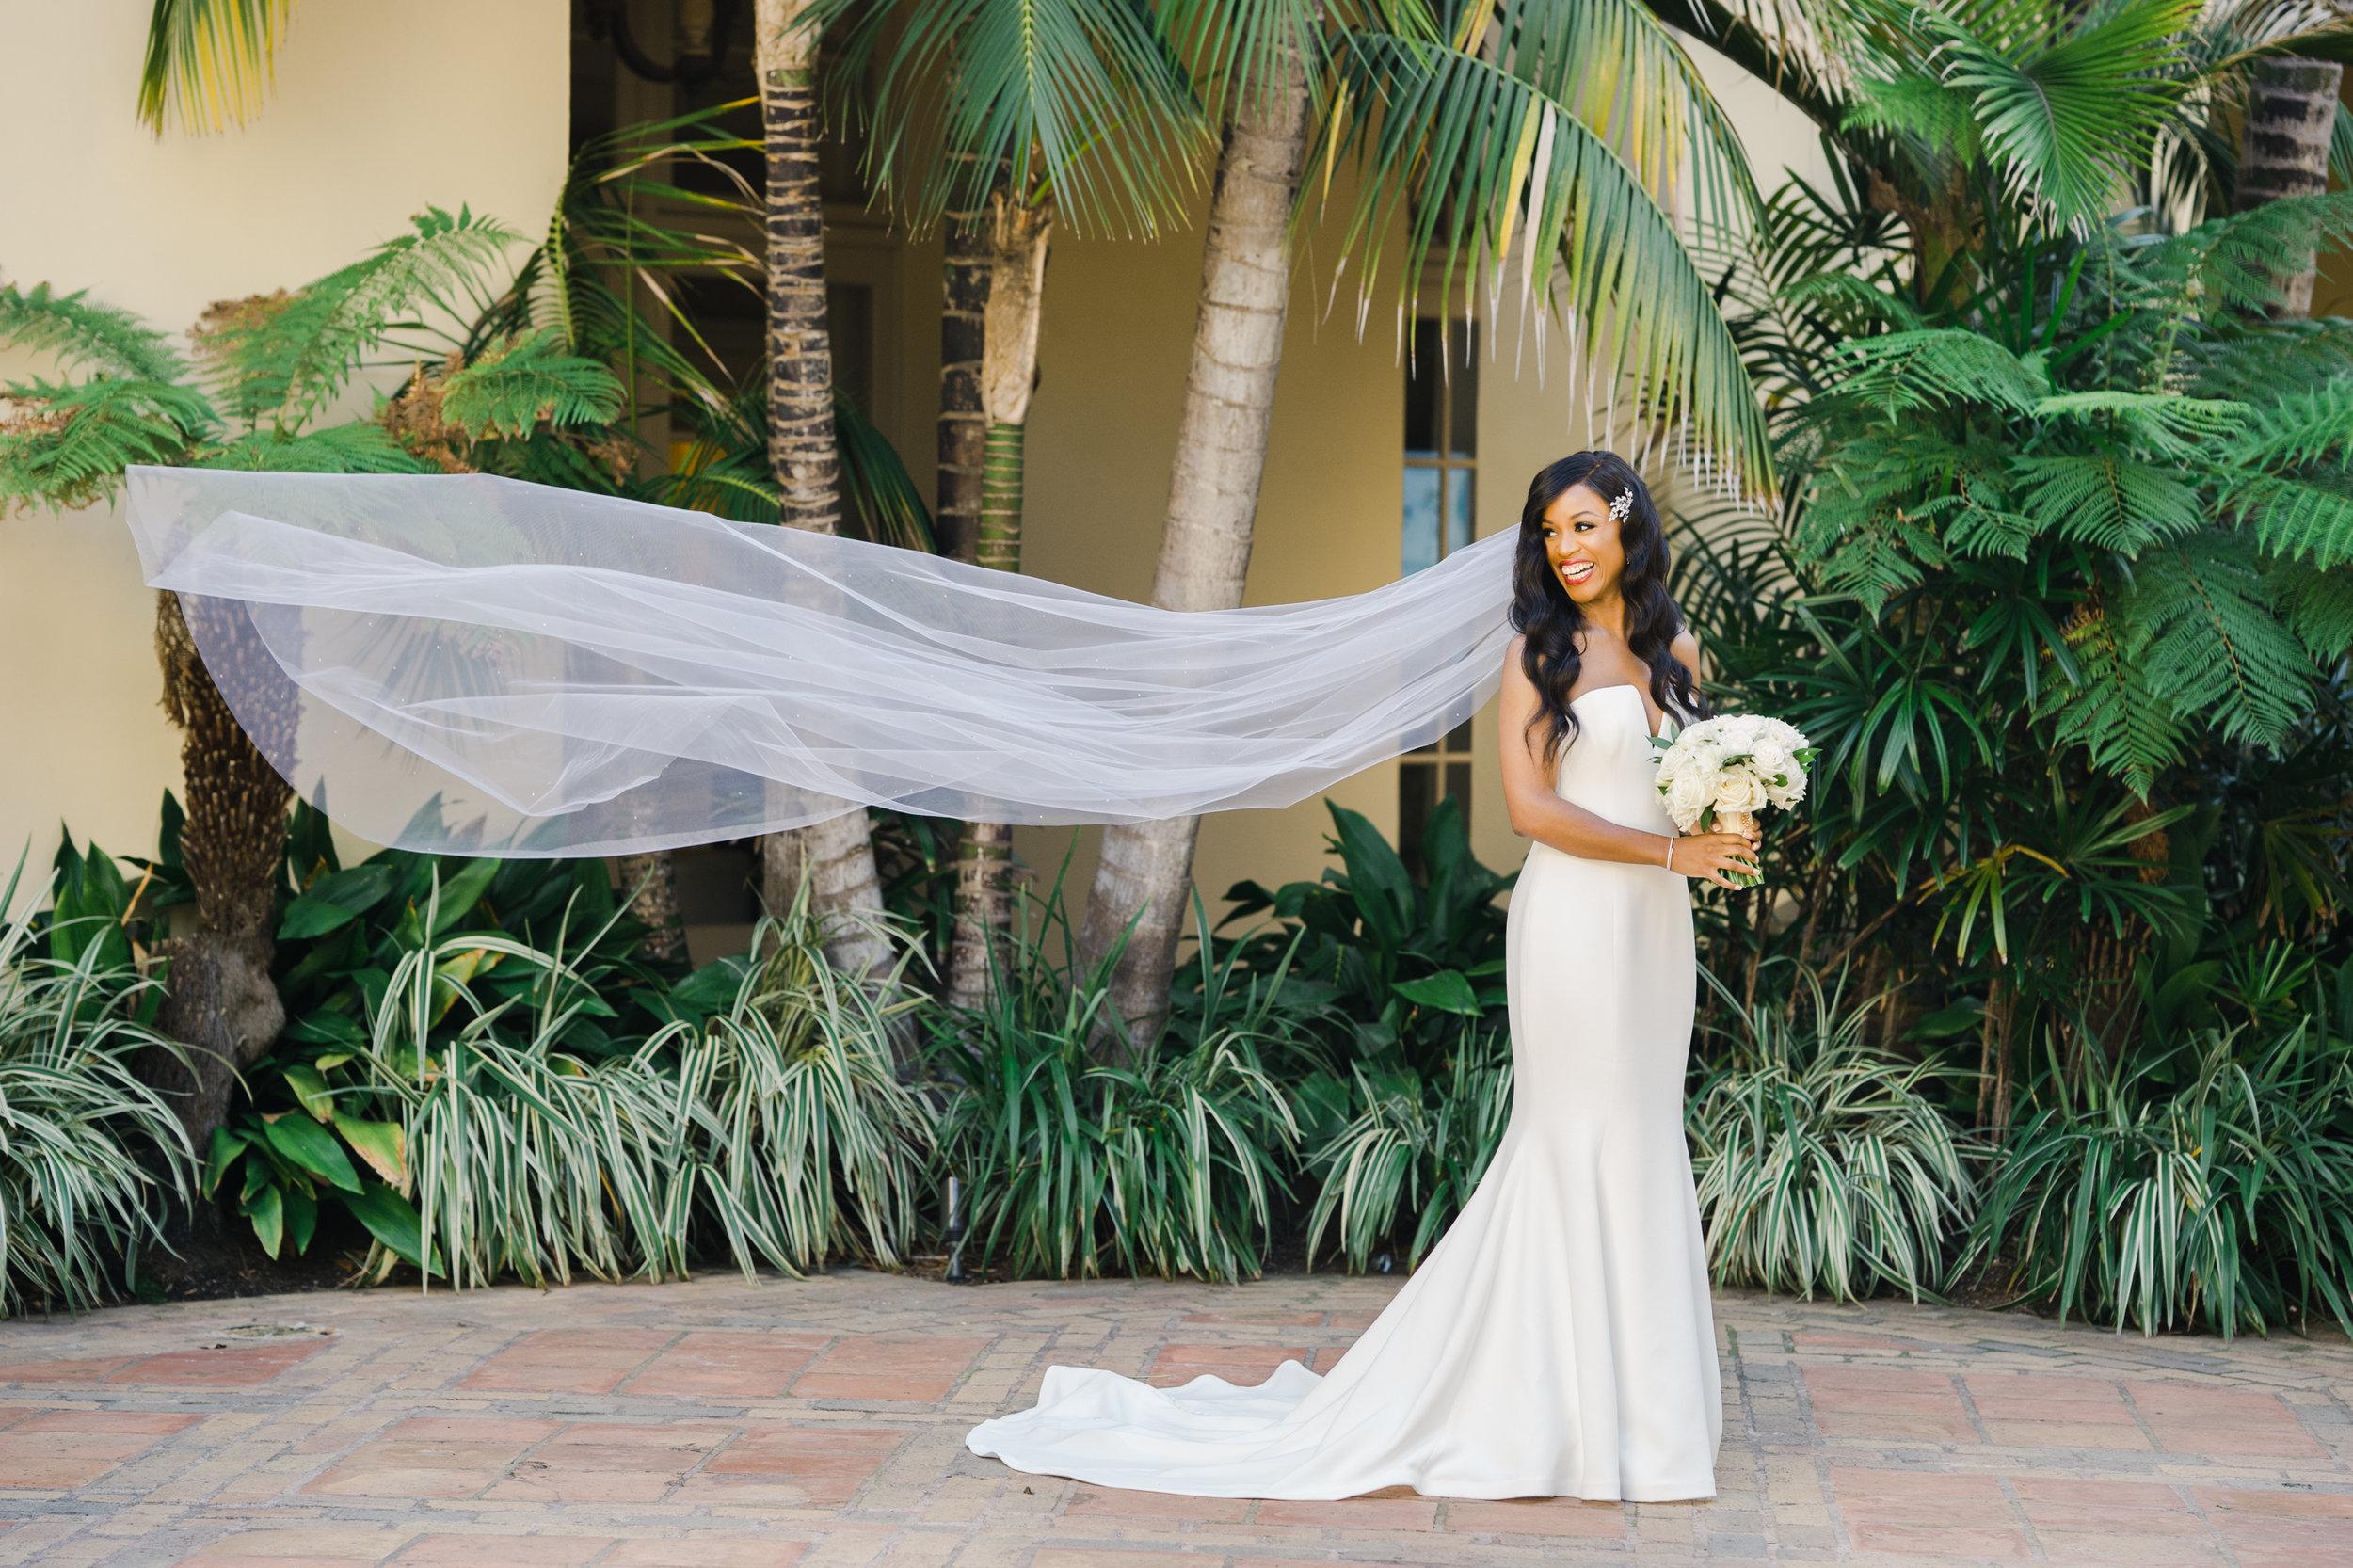 ritz-carlton-laguna-niguel-wedding-sonya_0051.JPG